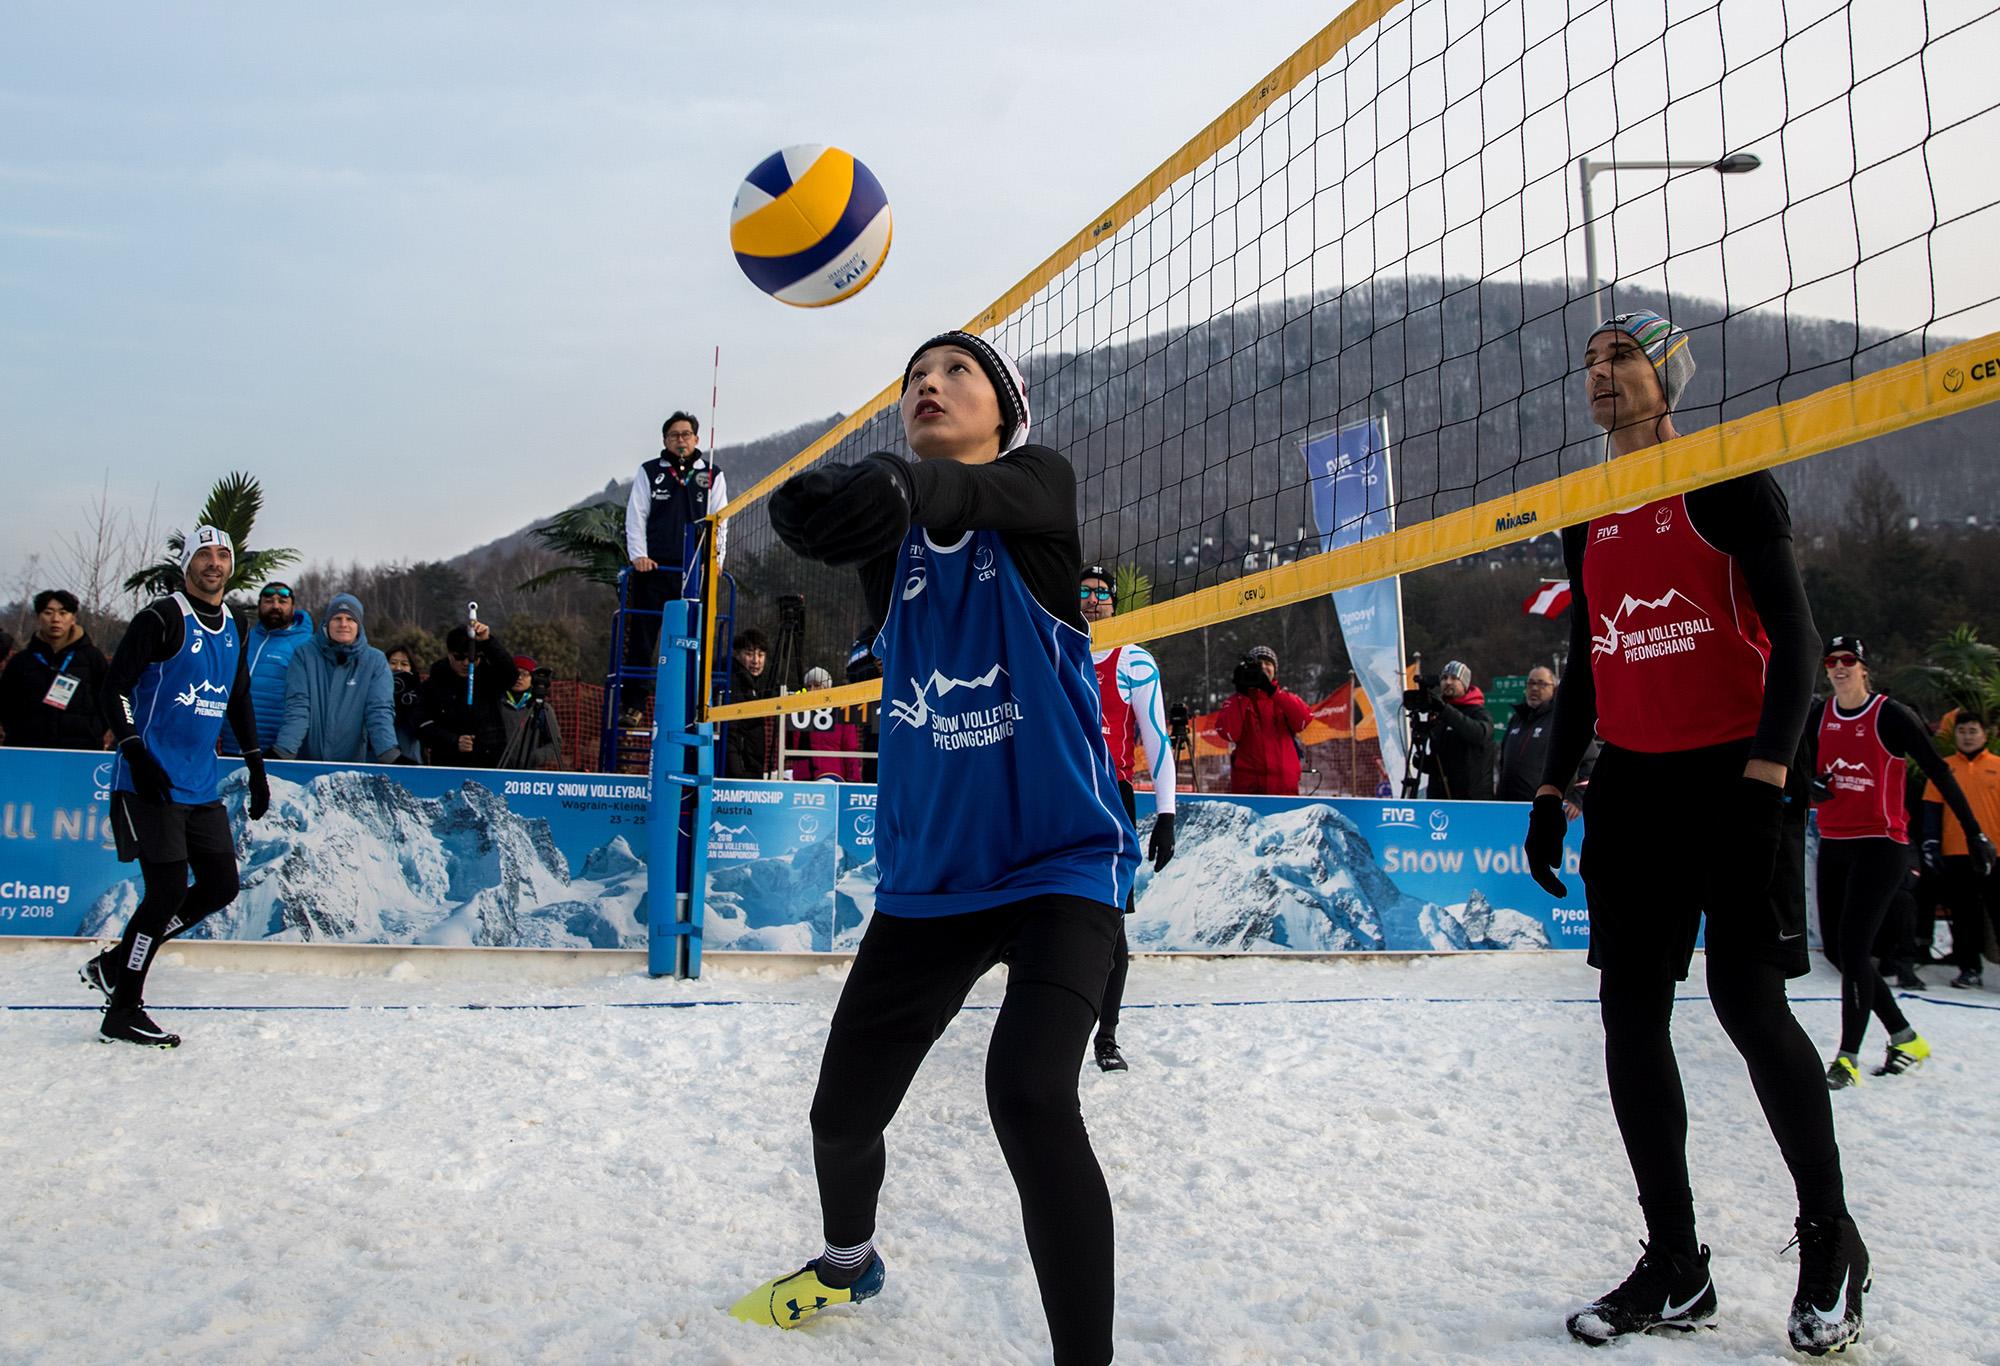 Volleyball at Both Olympics